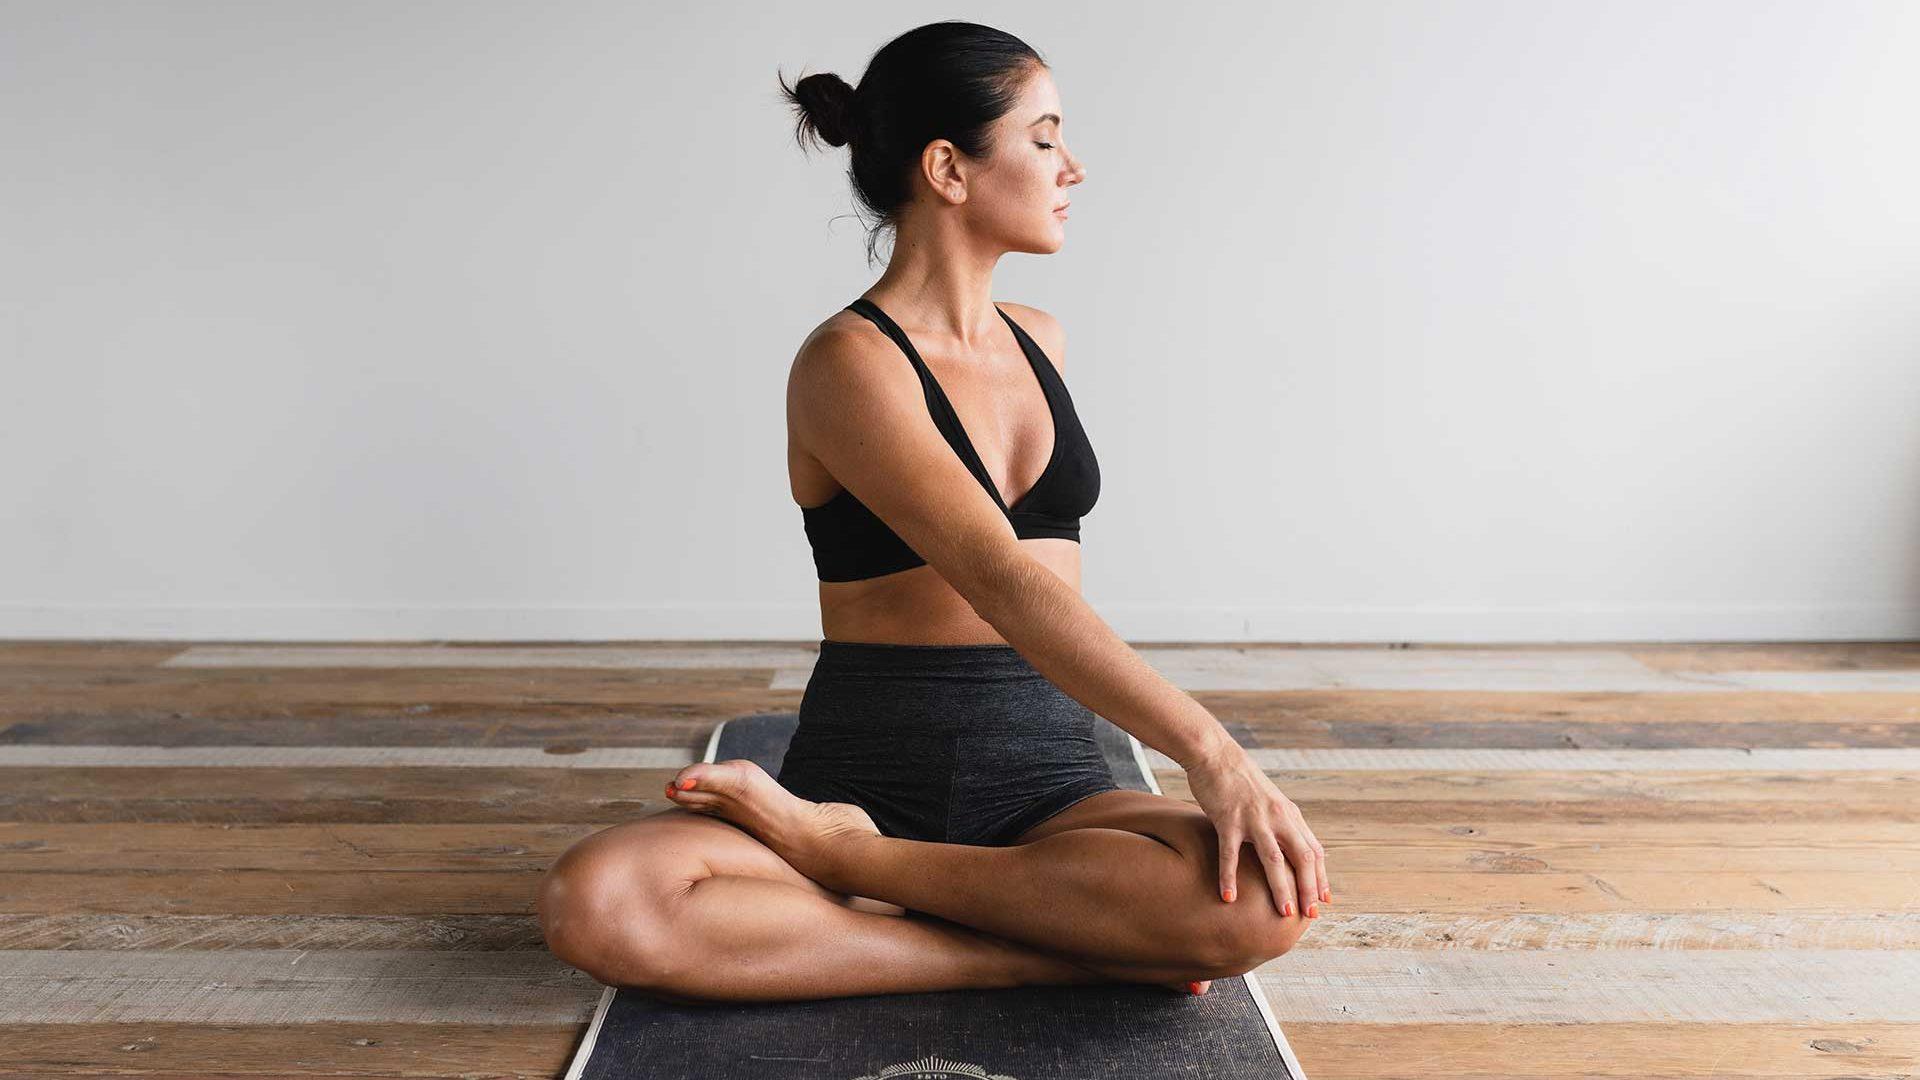 Yoga girl posing